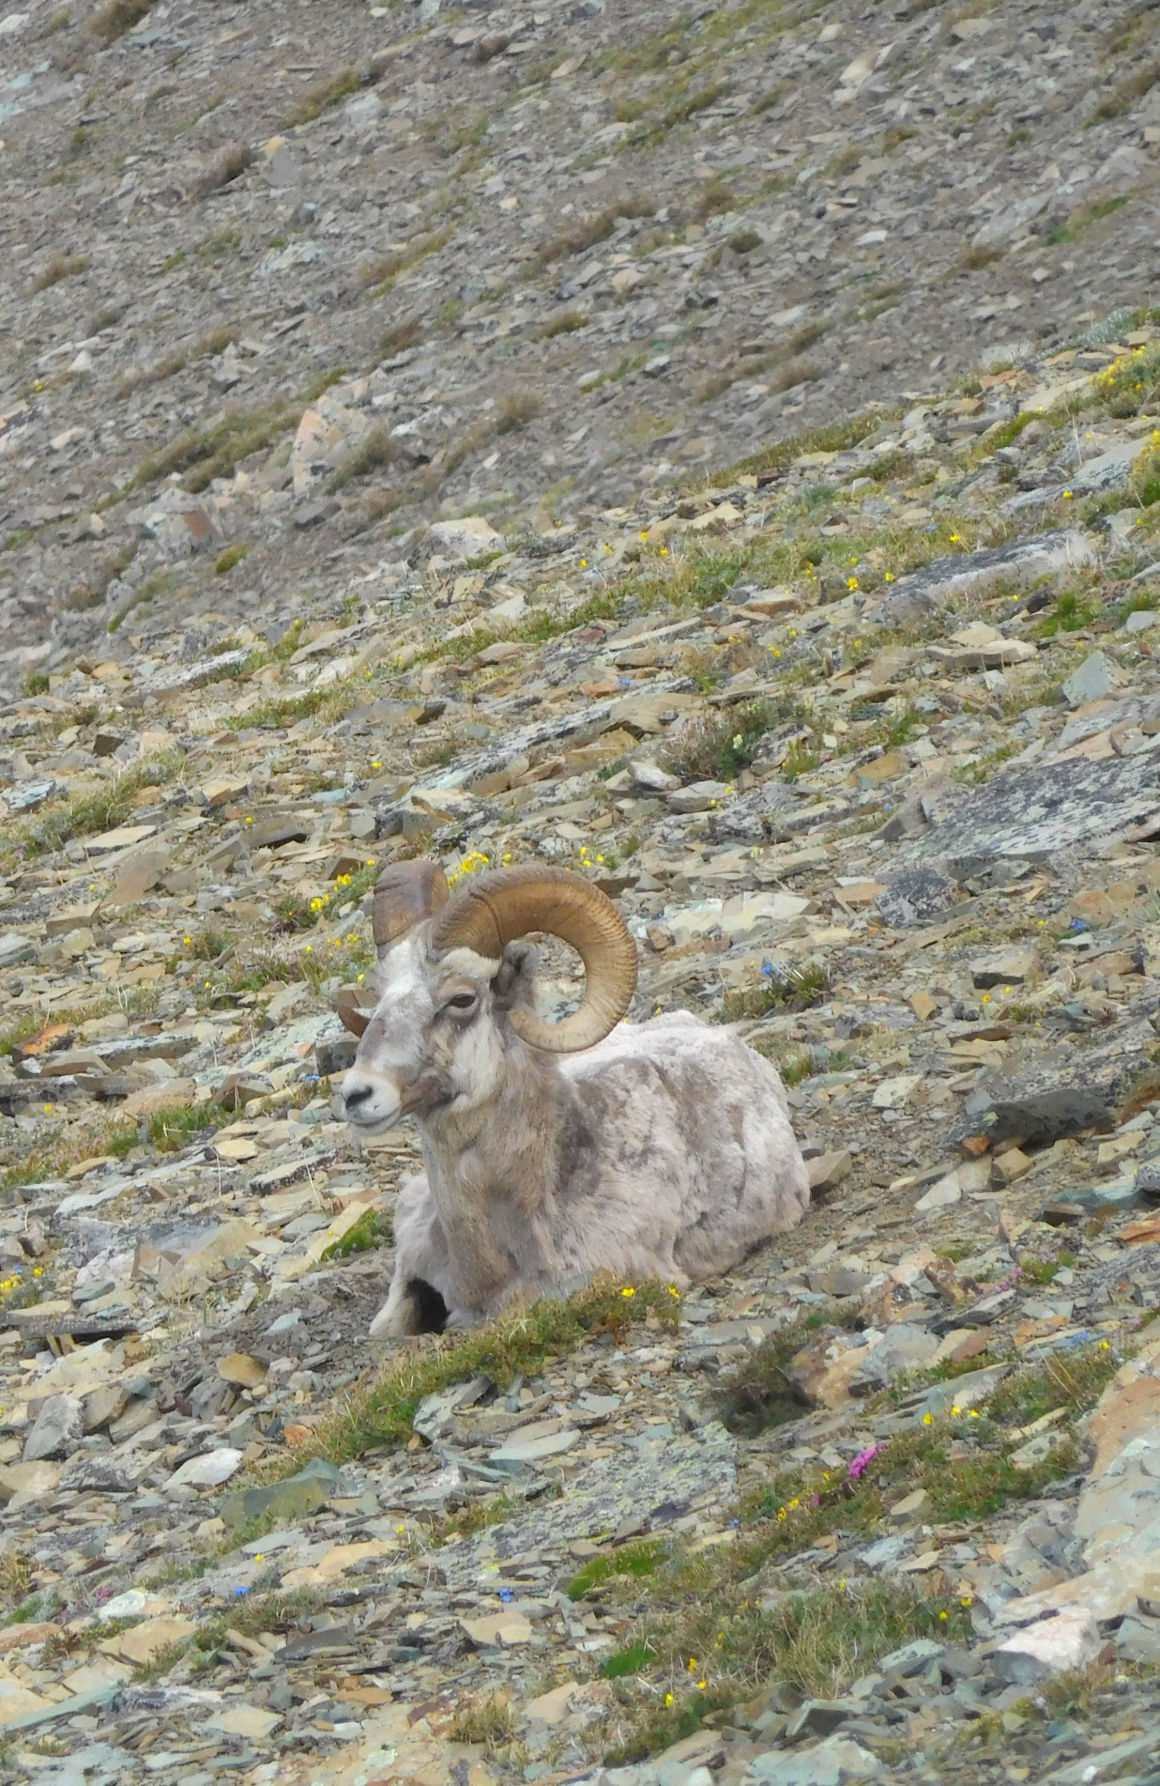 Bognorn sheep lying peacefully along the trail